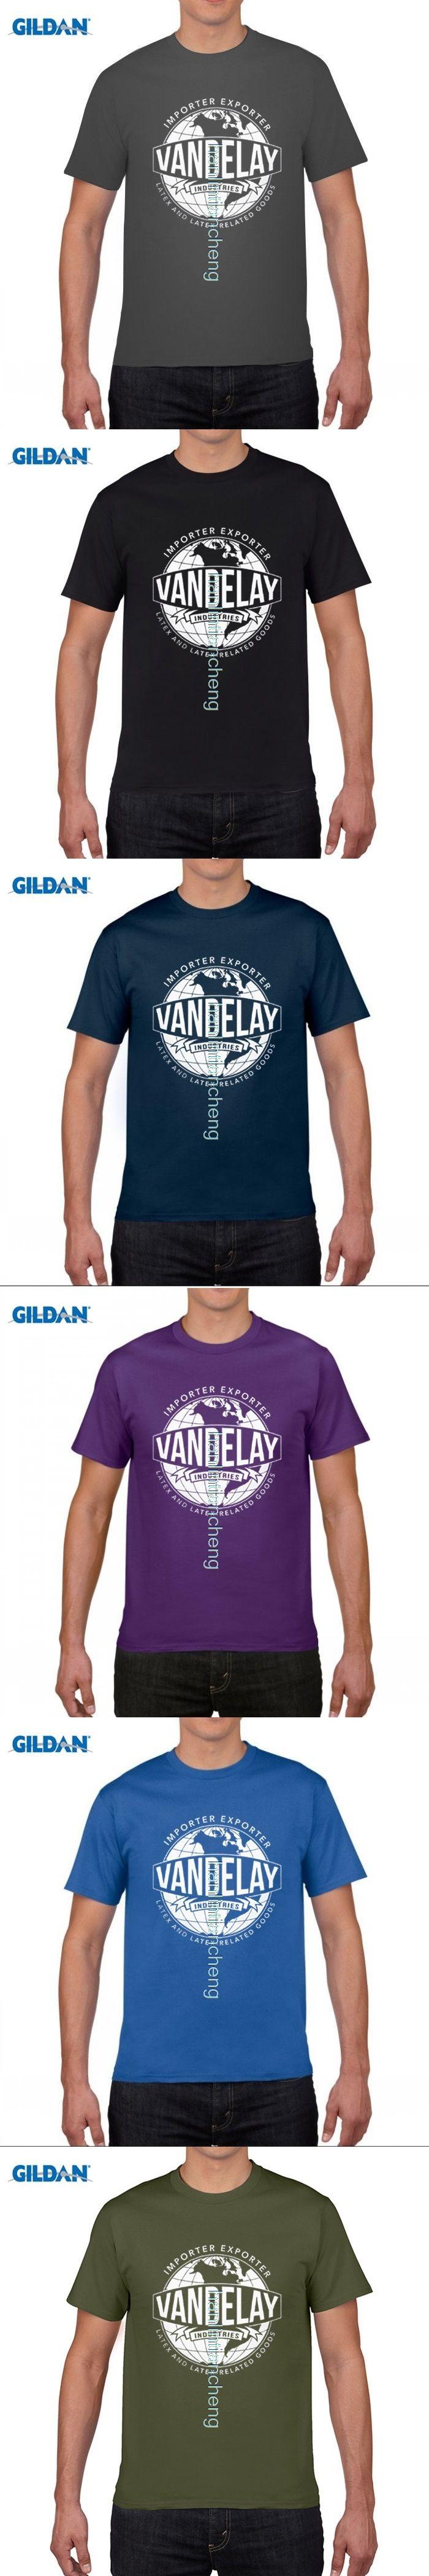 GILDAN DIY style mens t shirts Funny Vandelay Industries T-shirt-funny Shirt Seinfeld Tv Show By That Funny Shirt